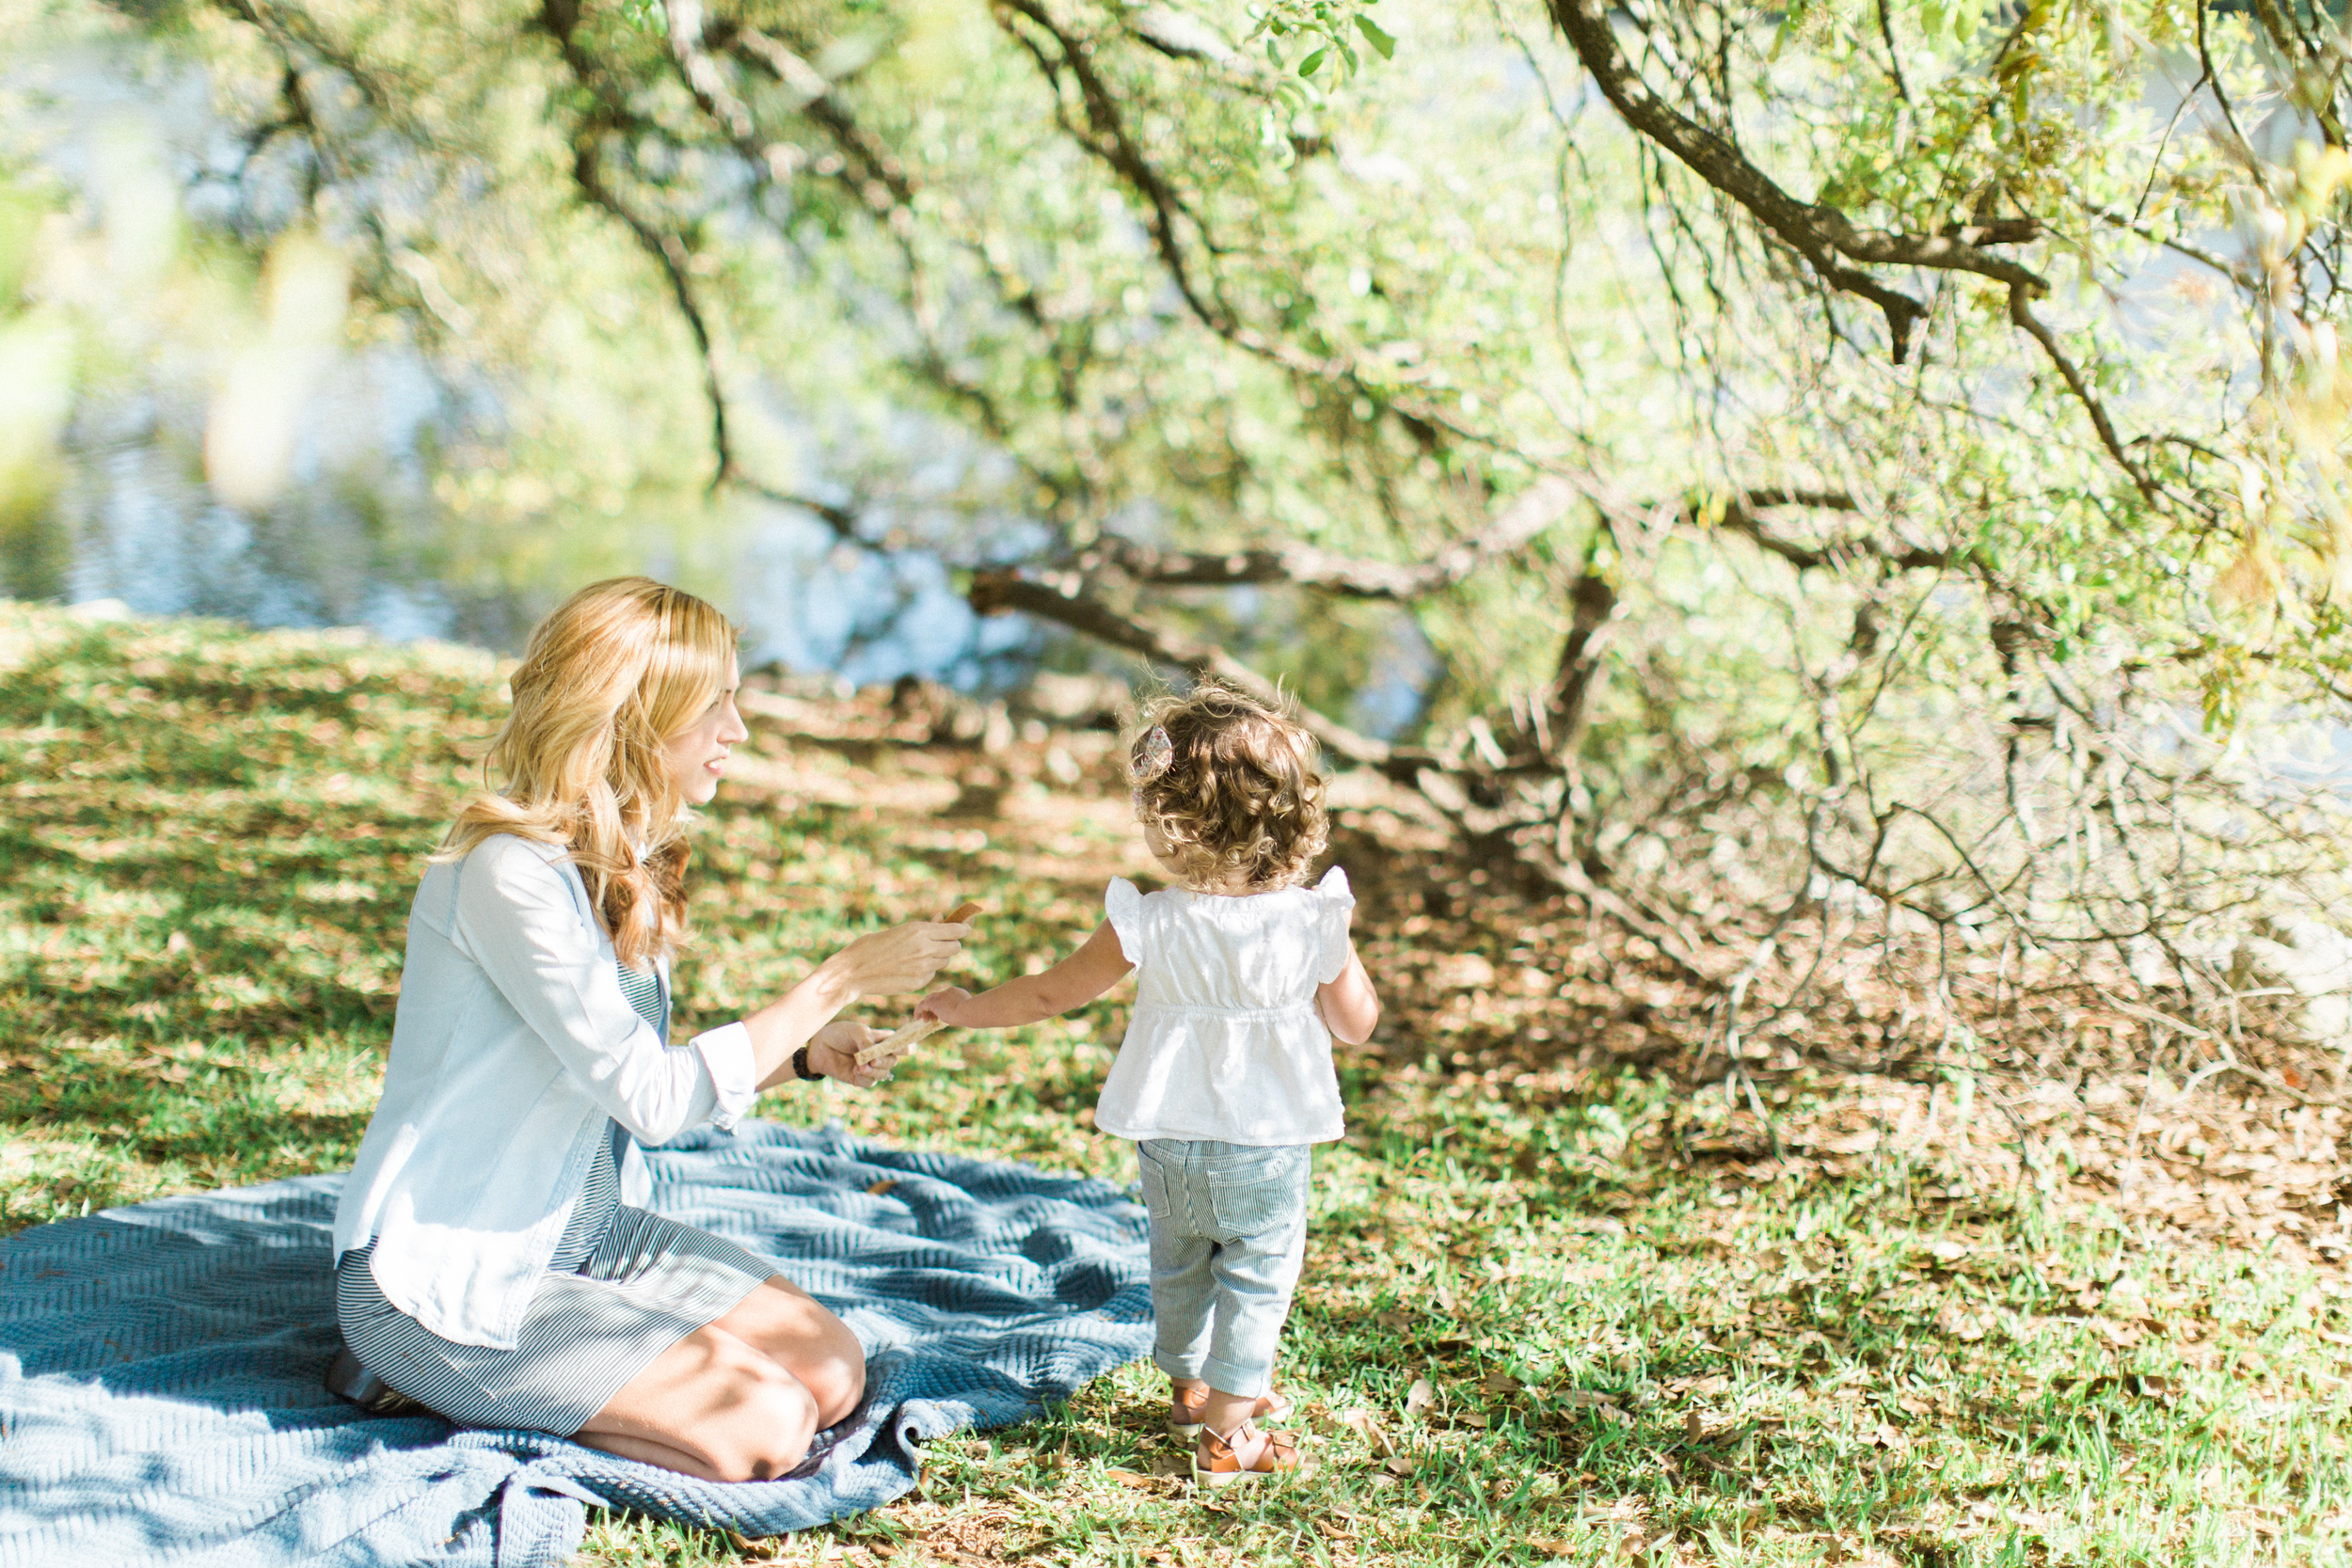 louisiana-spring-outdoor-lifestyle-portraits-Rebecca-Evie